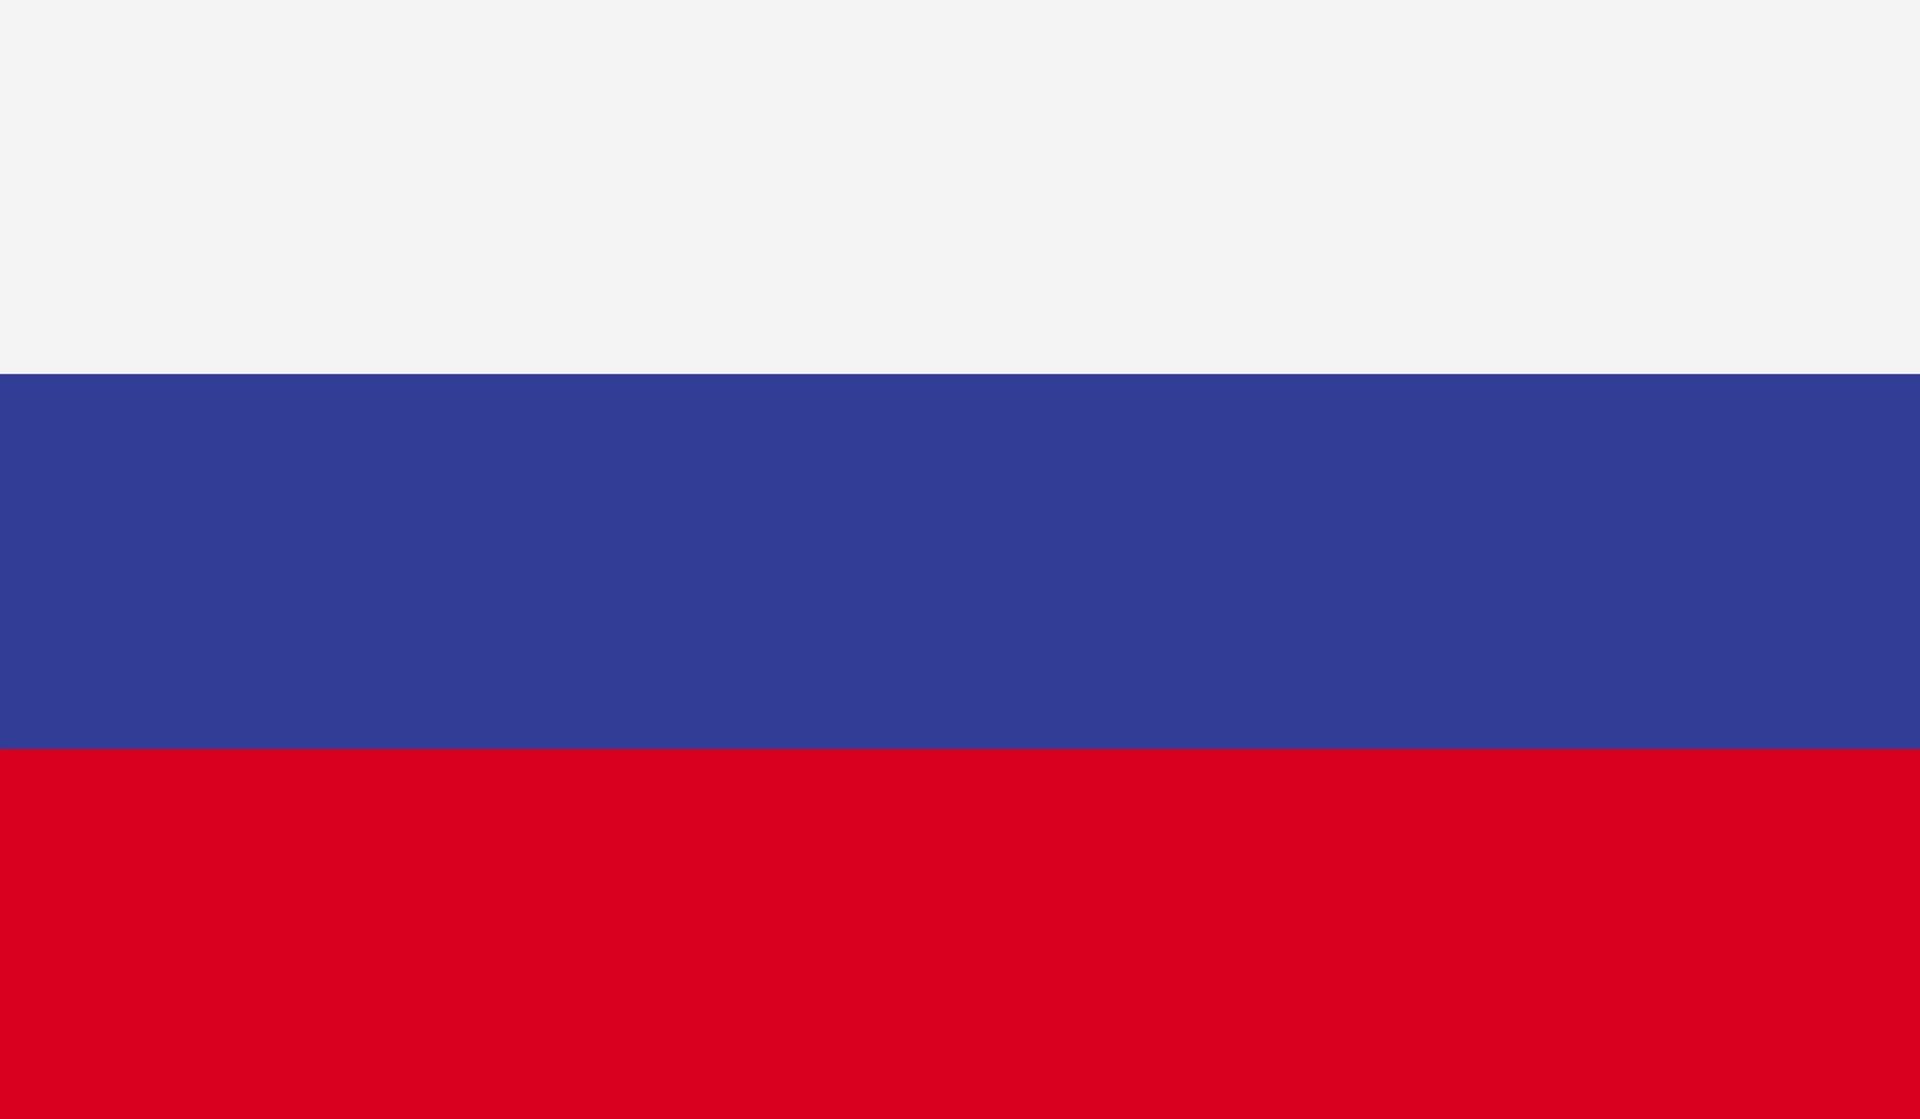 Россия~Ruukki